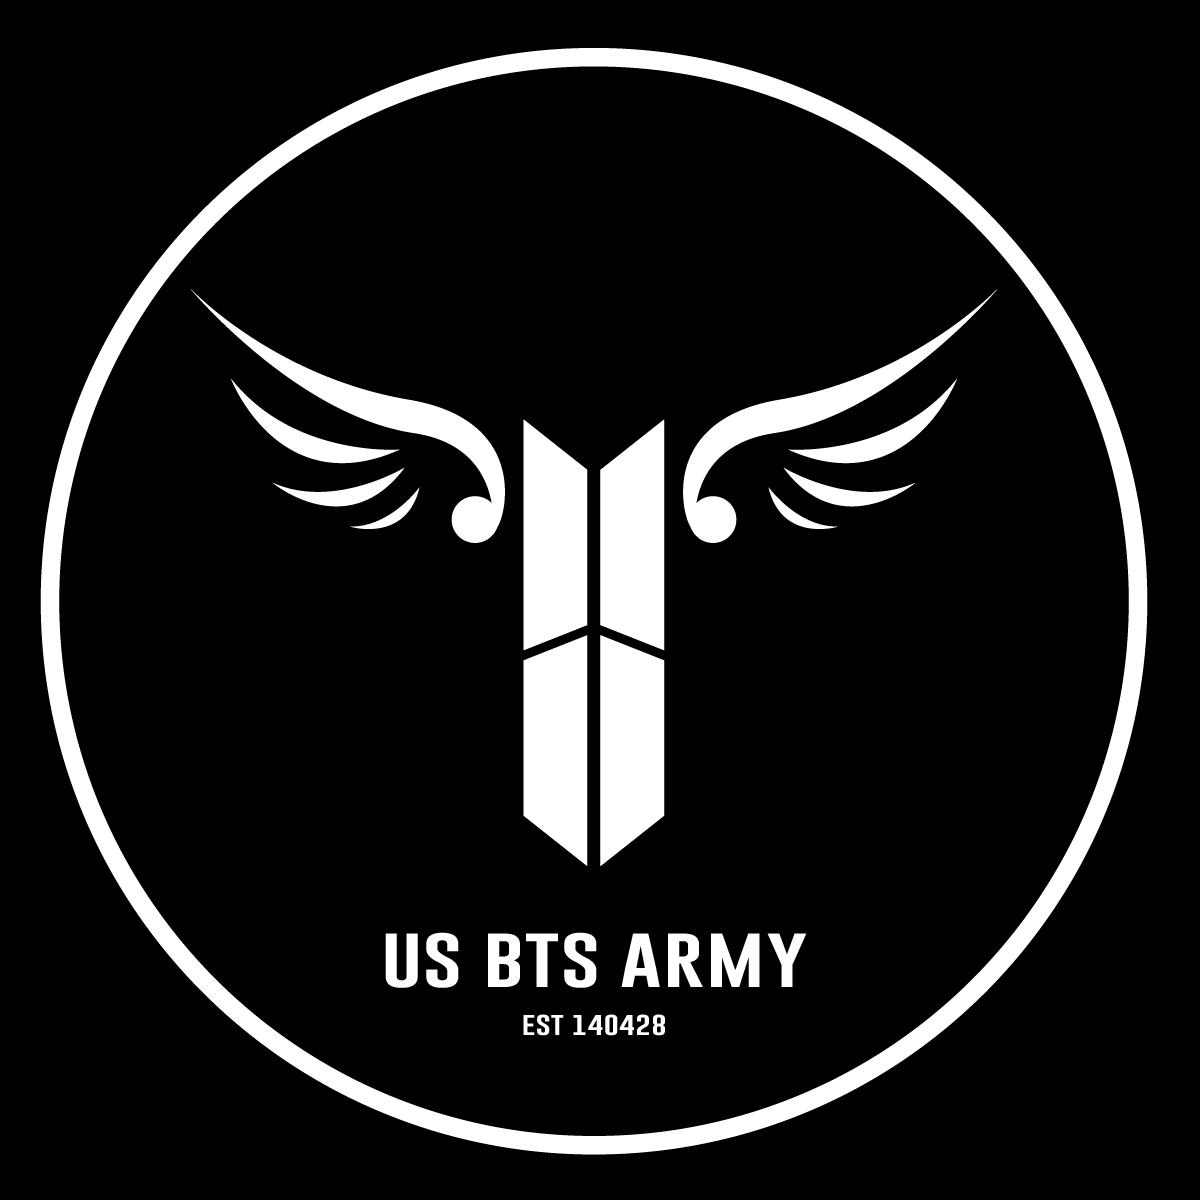 US BTS ARMY